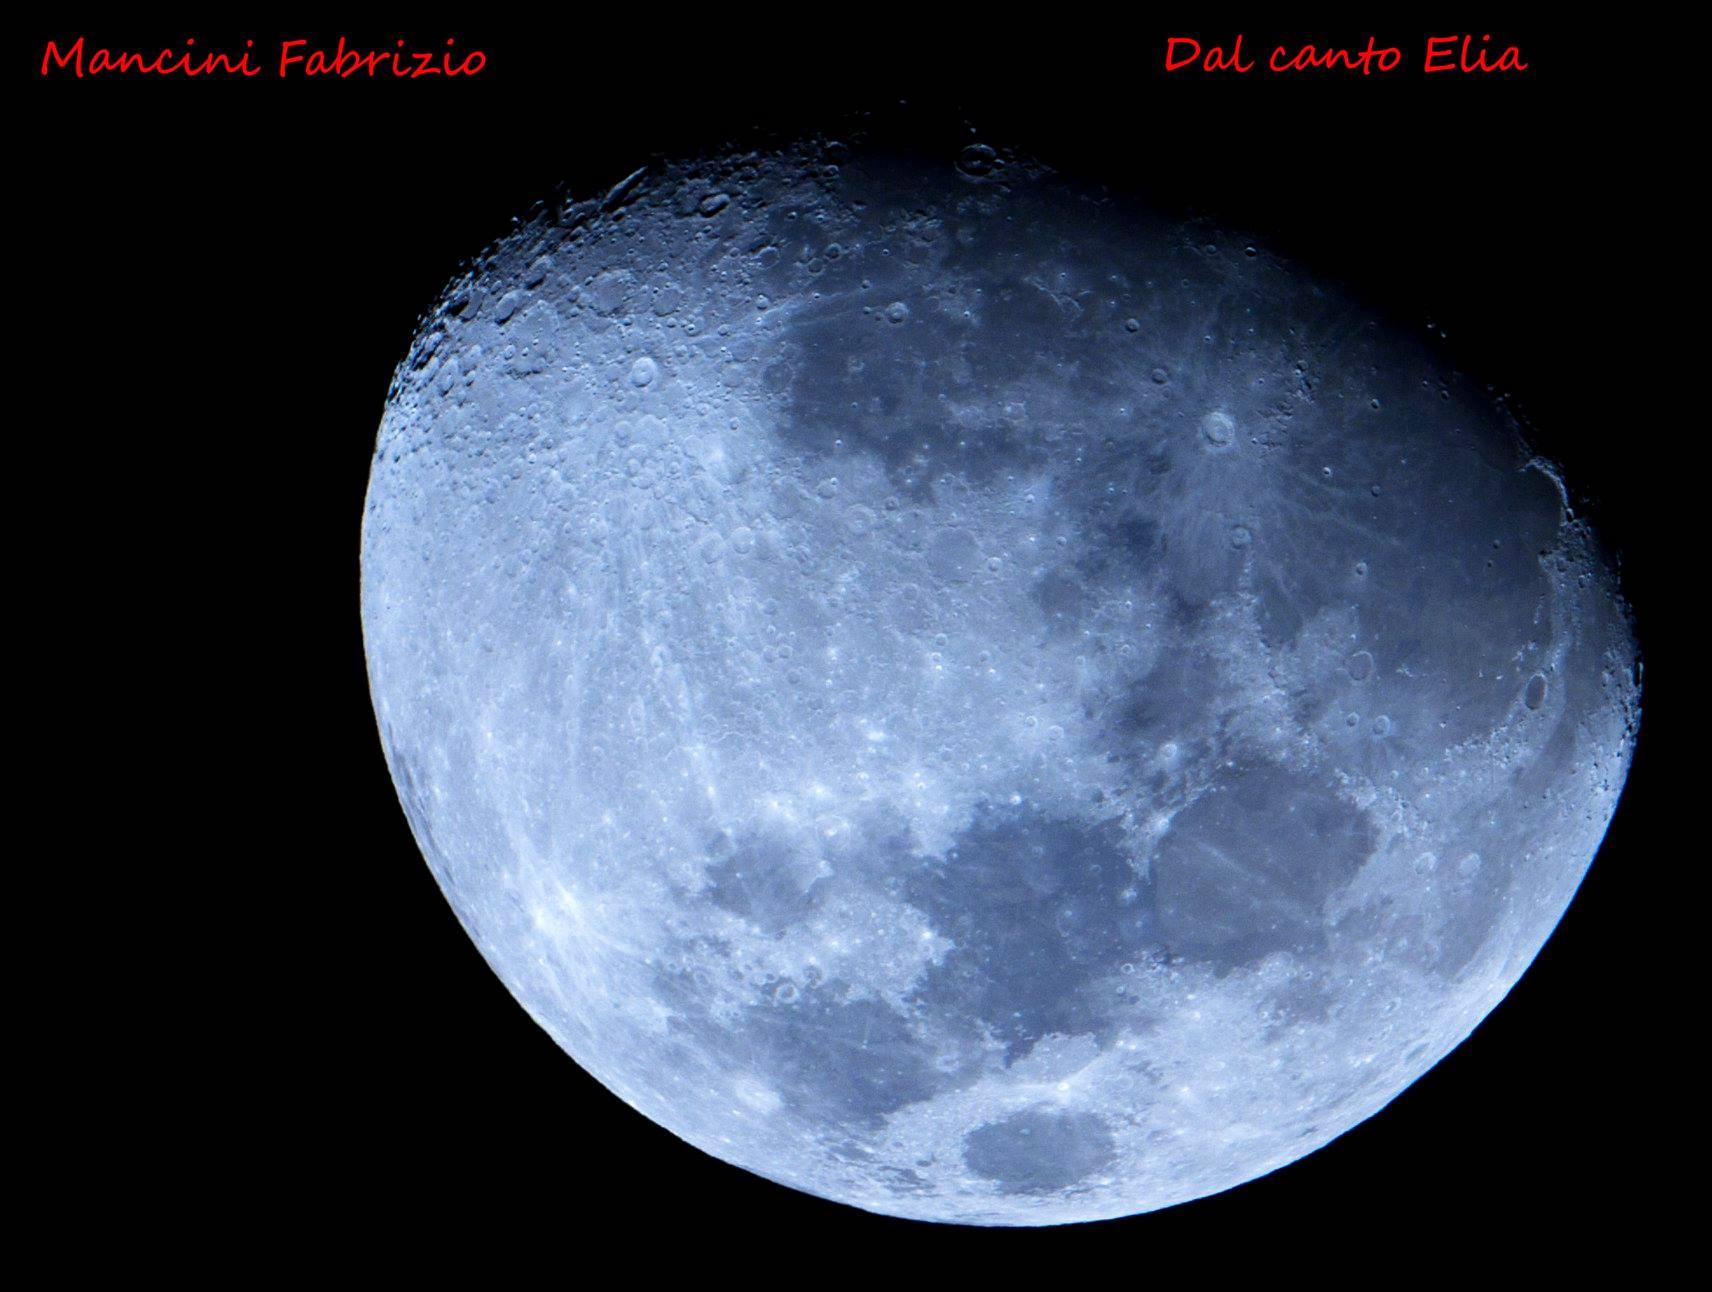 luna-dalcanto-mancini-57456860_2181422638602319_2918504464602103808_o.jpg